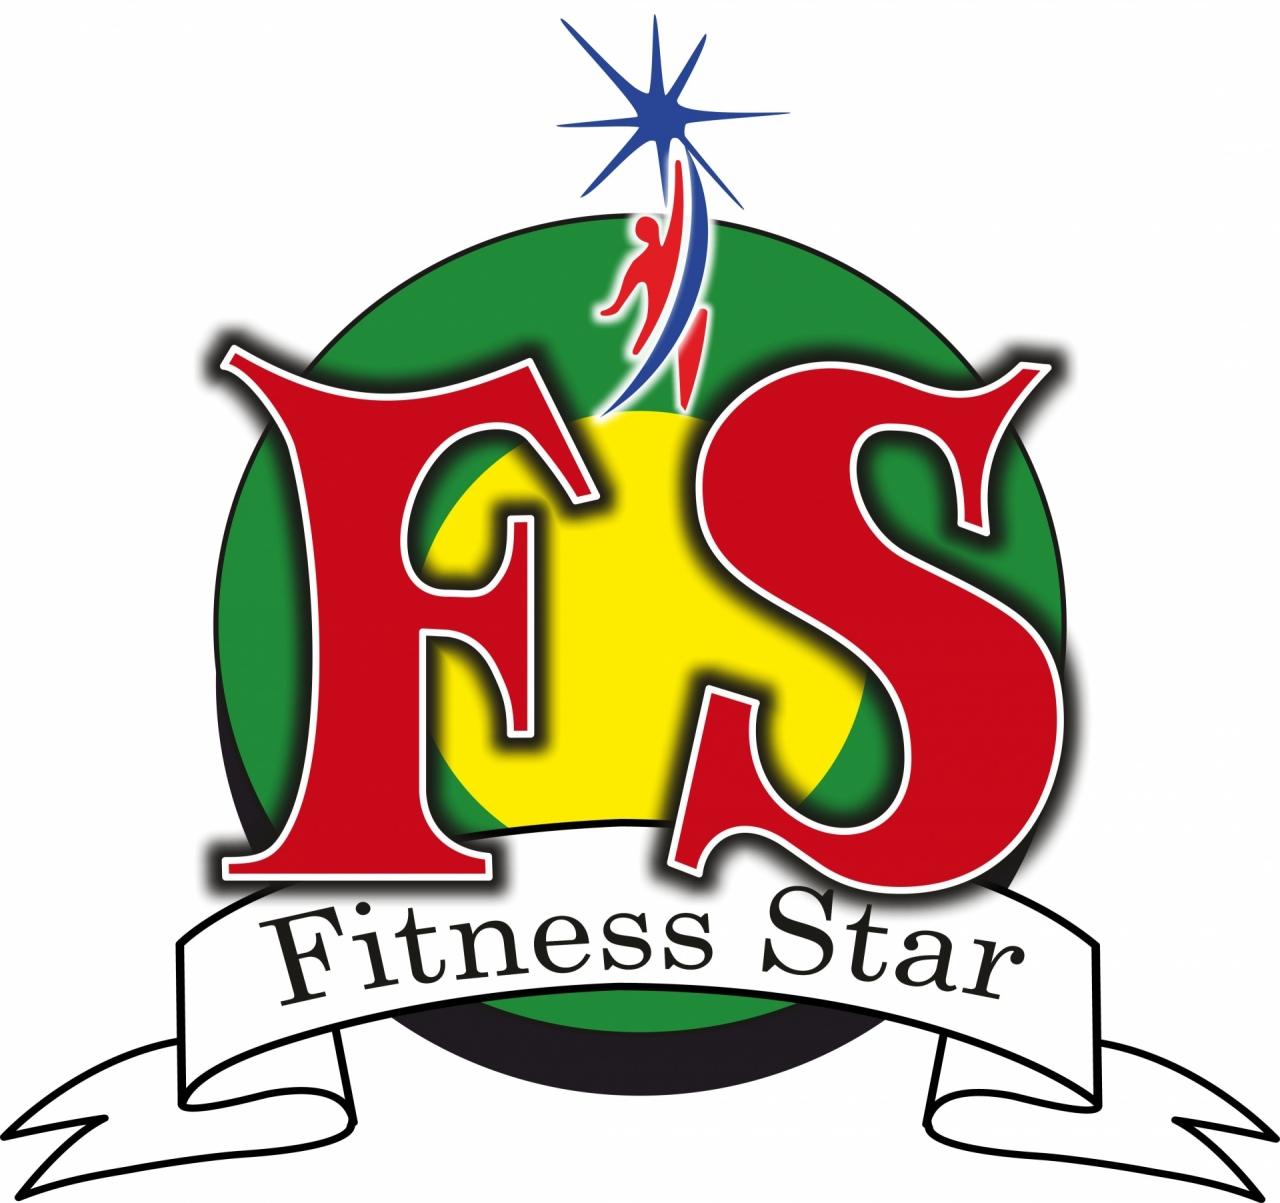 https://instagram.com/fitness_star_fs?igshid=xv7iyu0xixl8